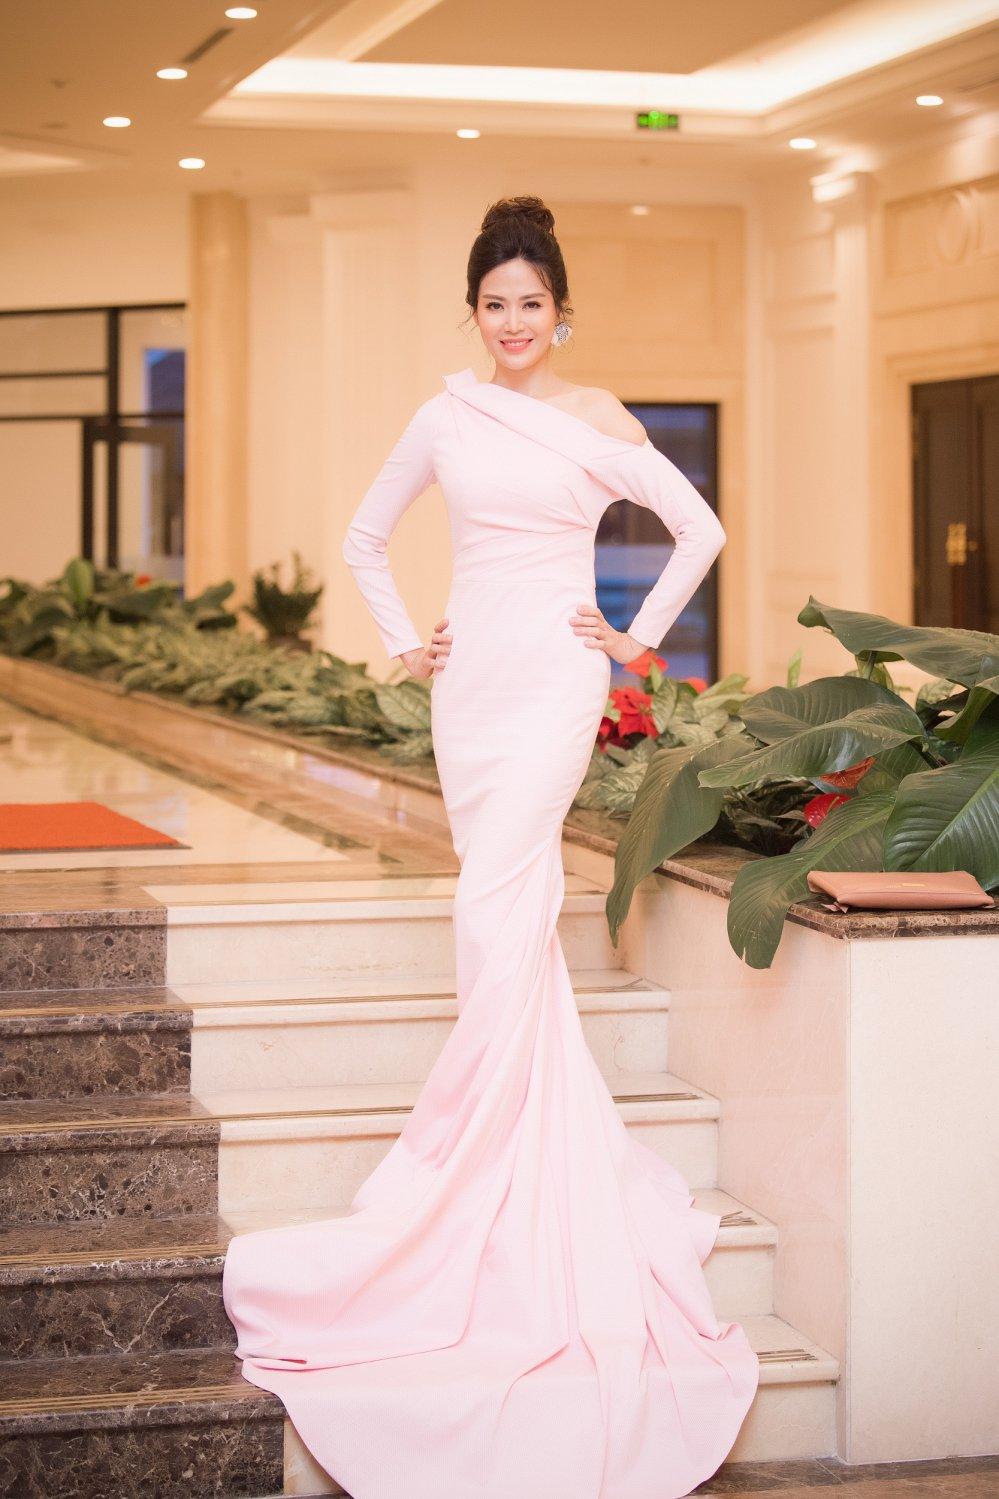 Huong Giang bat ngo khong dien o vi tri vedette cung Pham Huong hinh anh 5